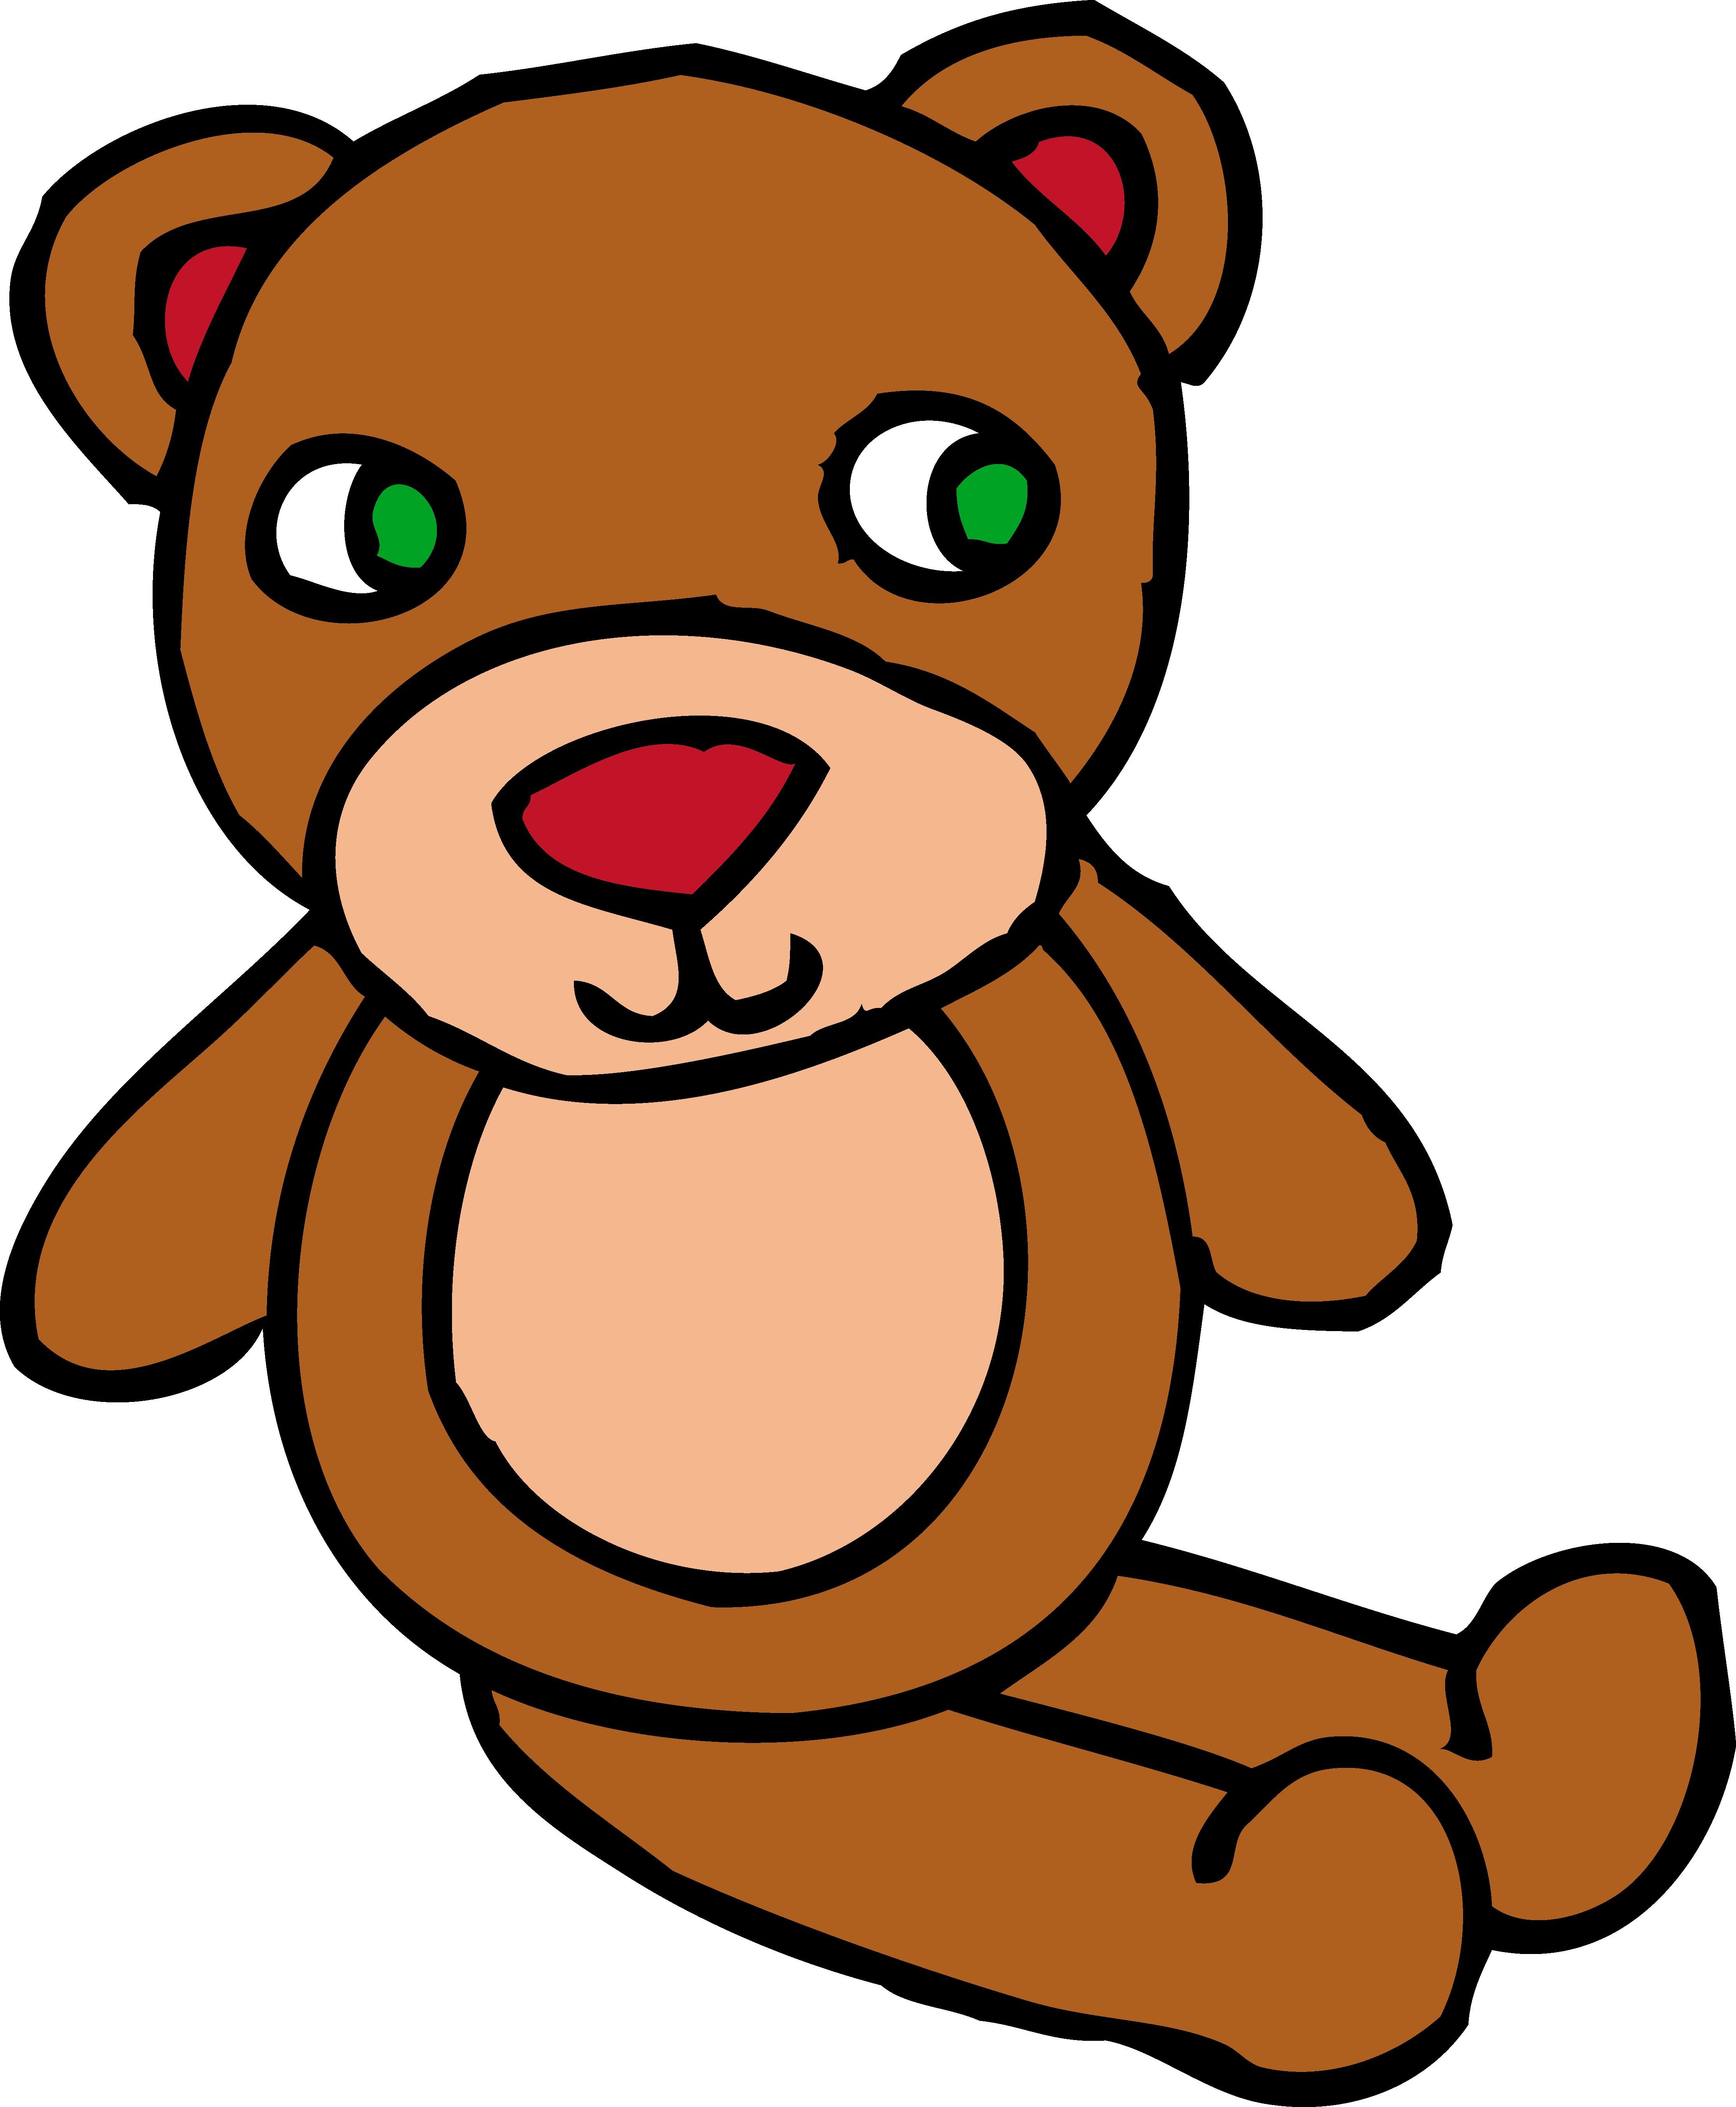 4459x5412 Clip Art Standing Bear Clipart Panda Free Images Noticeable